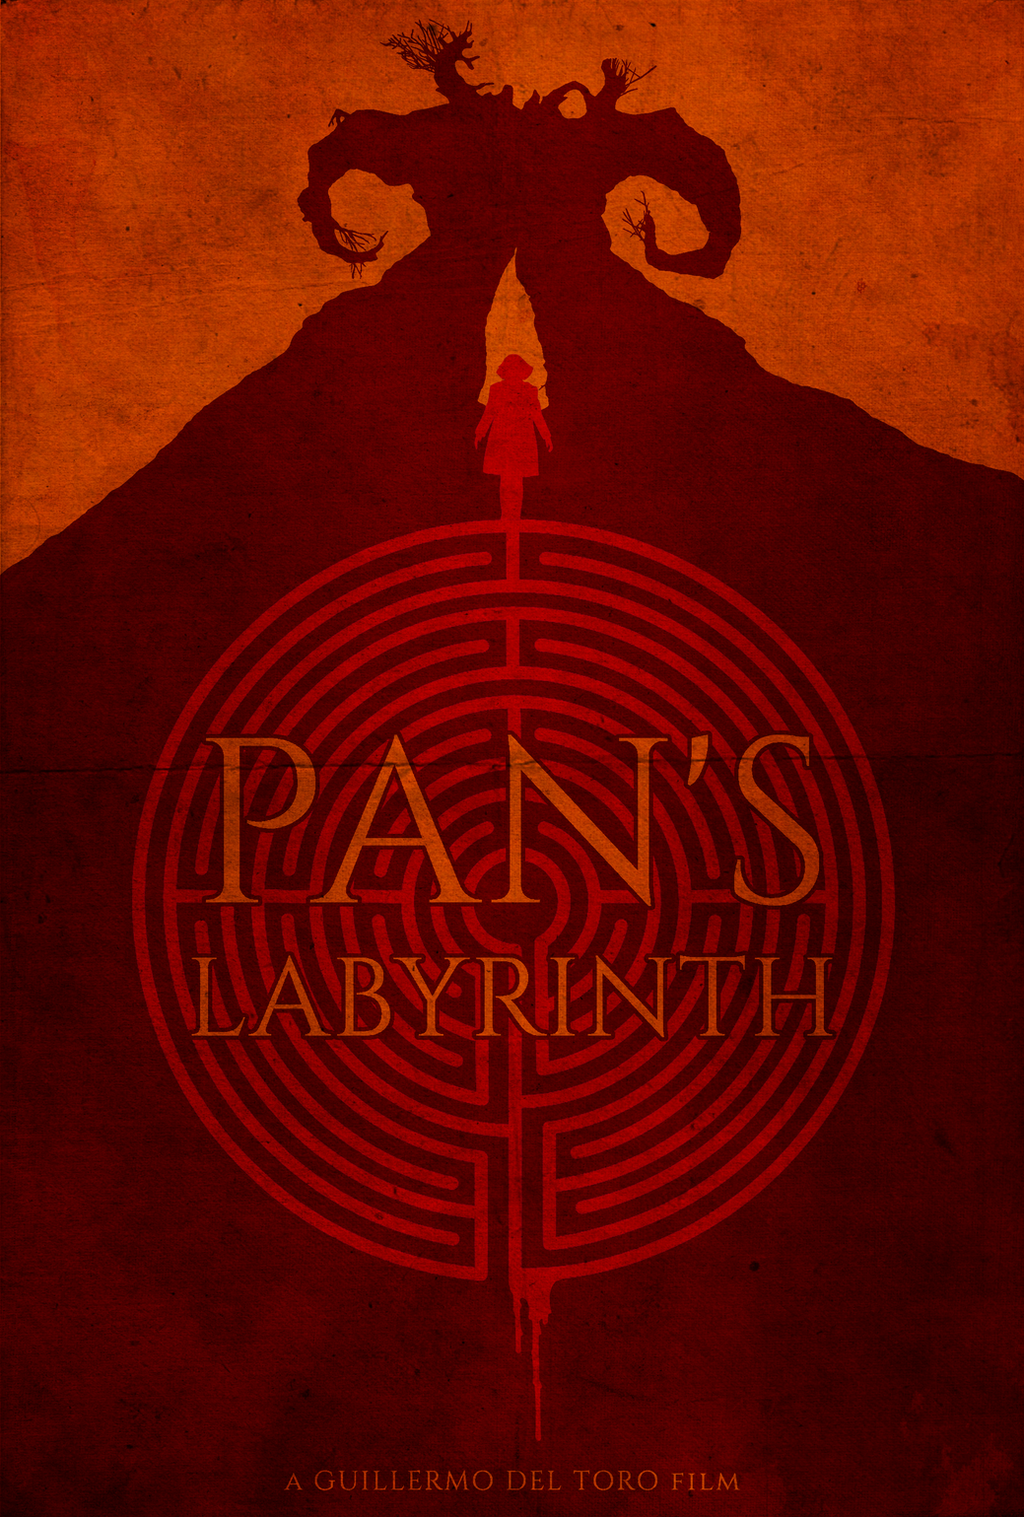 pan ohydrates labyrinth evaluation essay